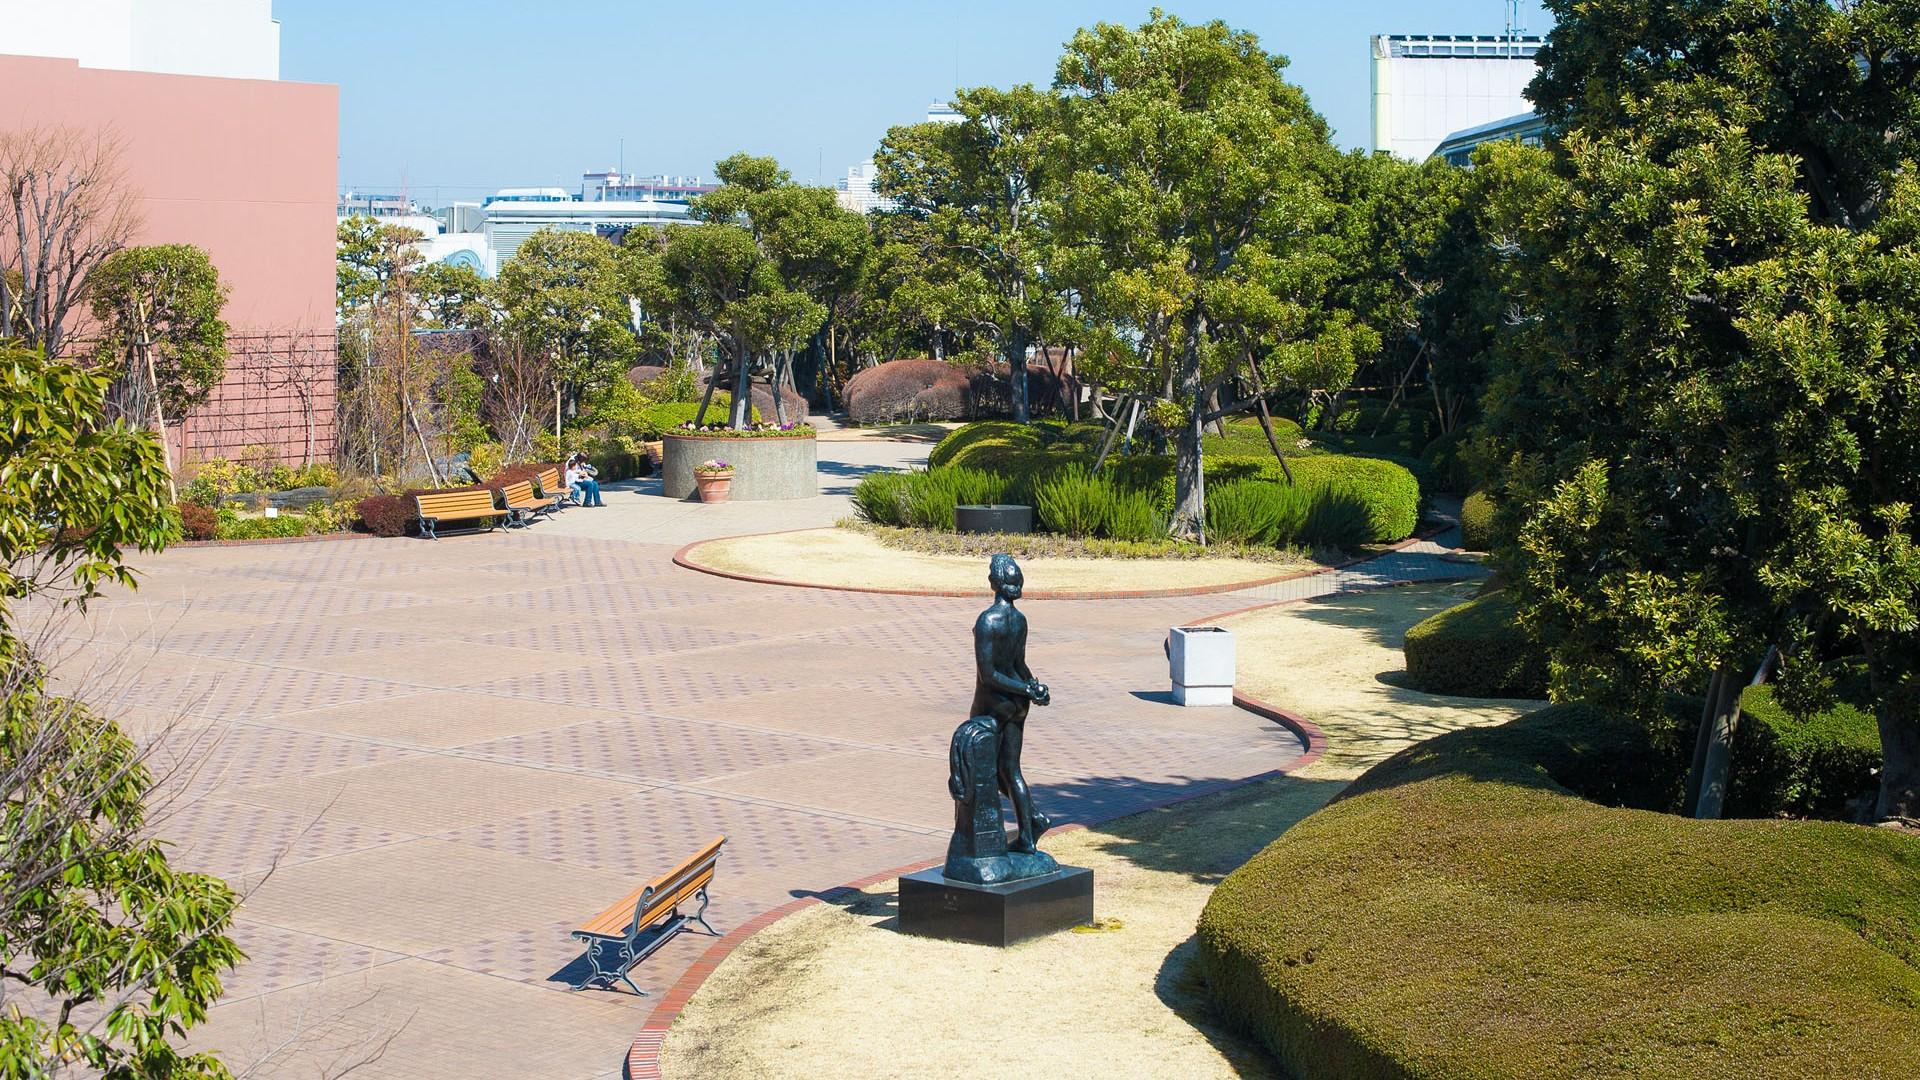 Joinus森林雕塑公园